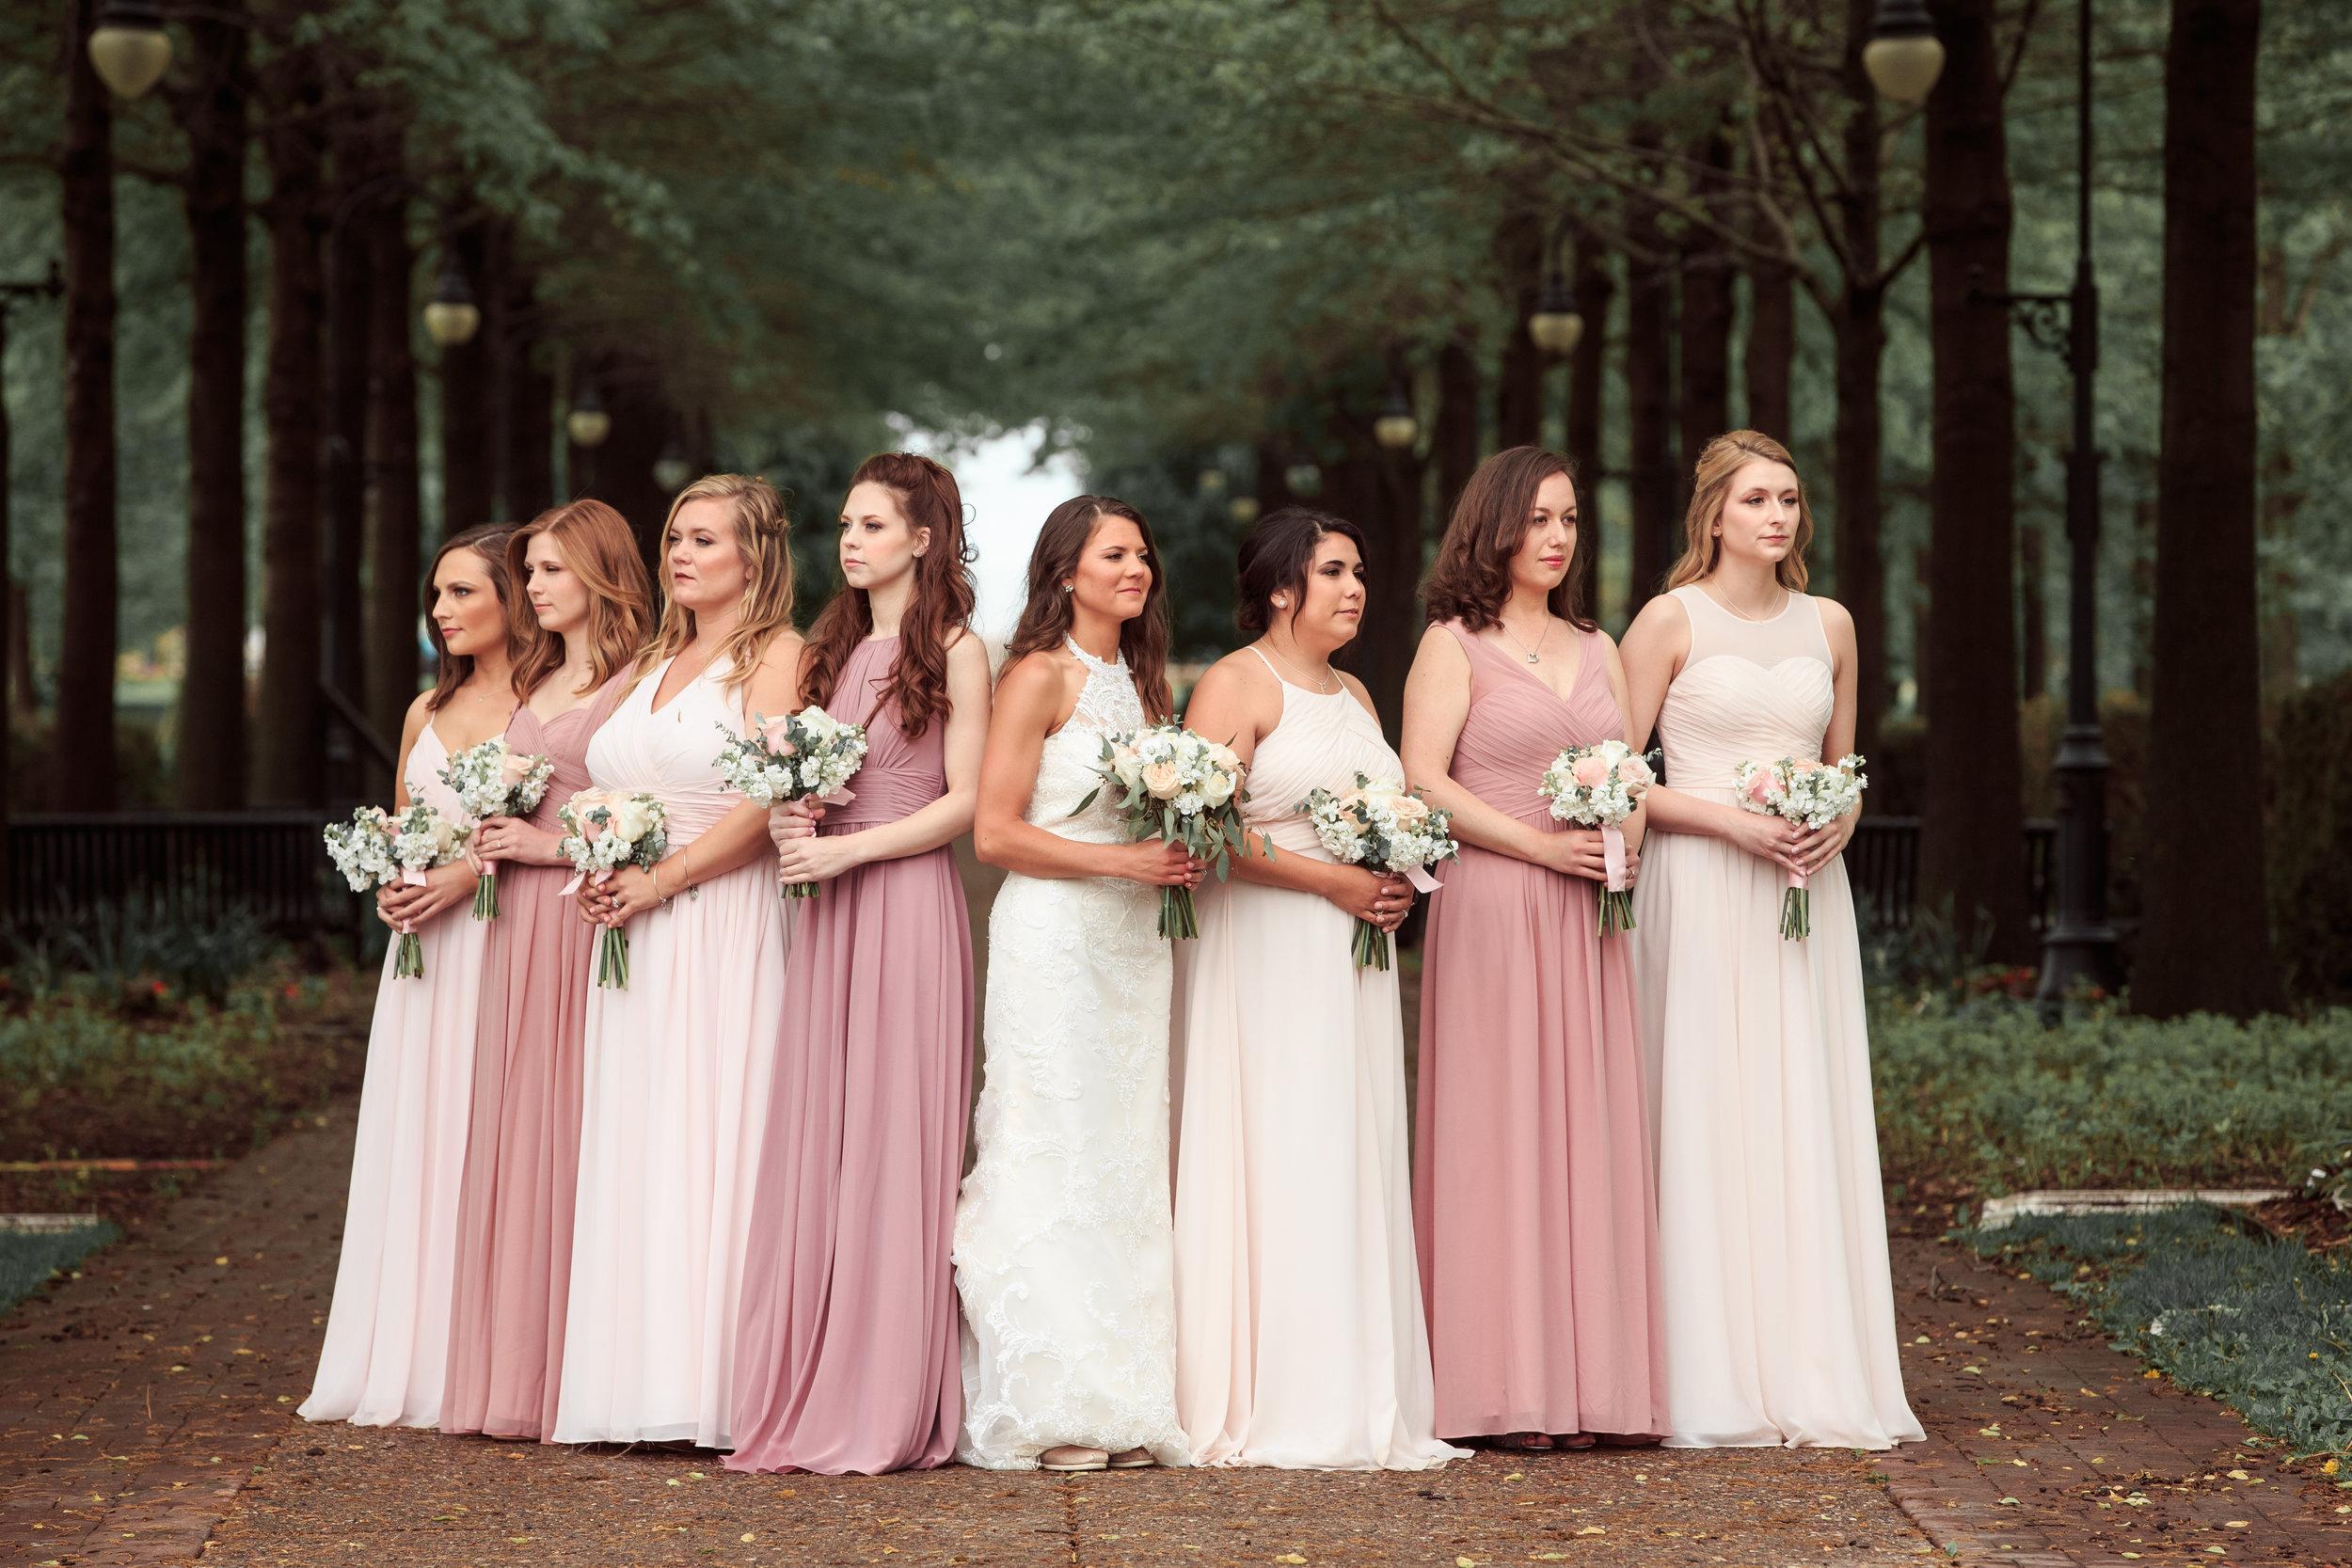 Bridesmaids-pose-ideas-davenport-wedding.jpg